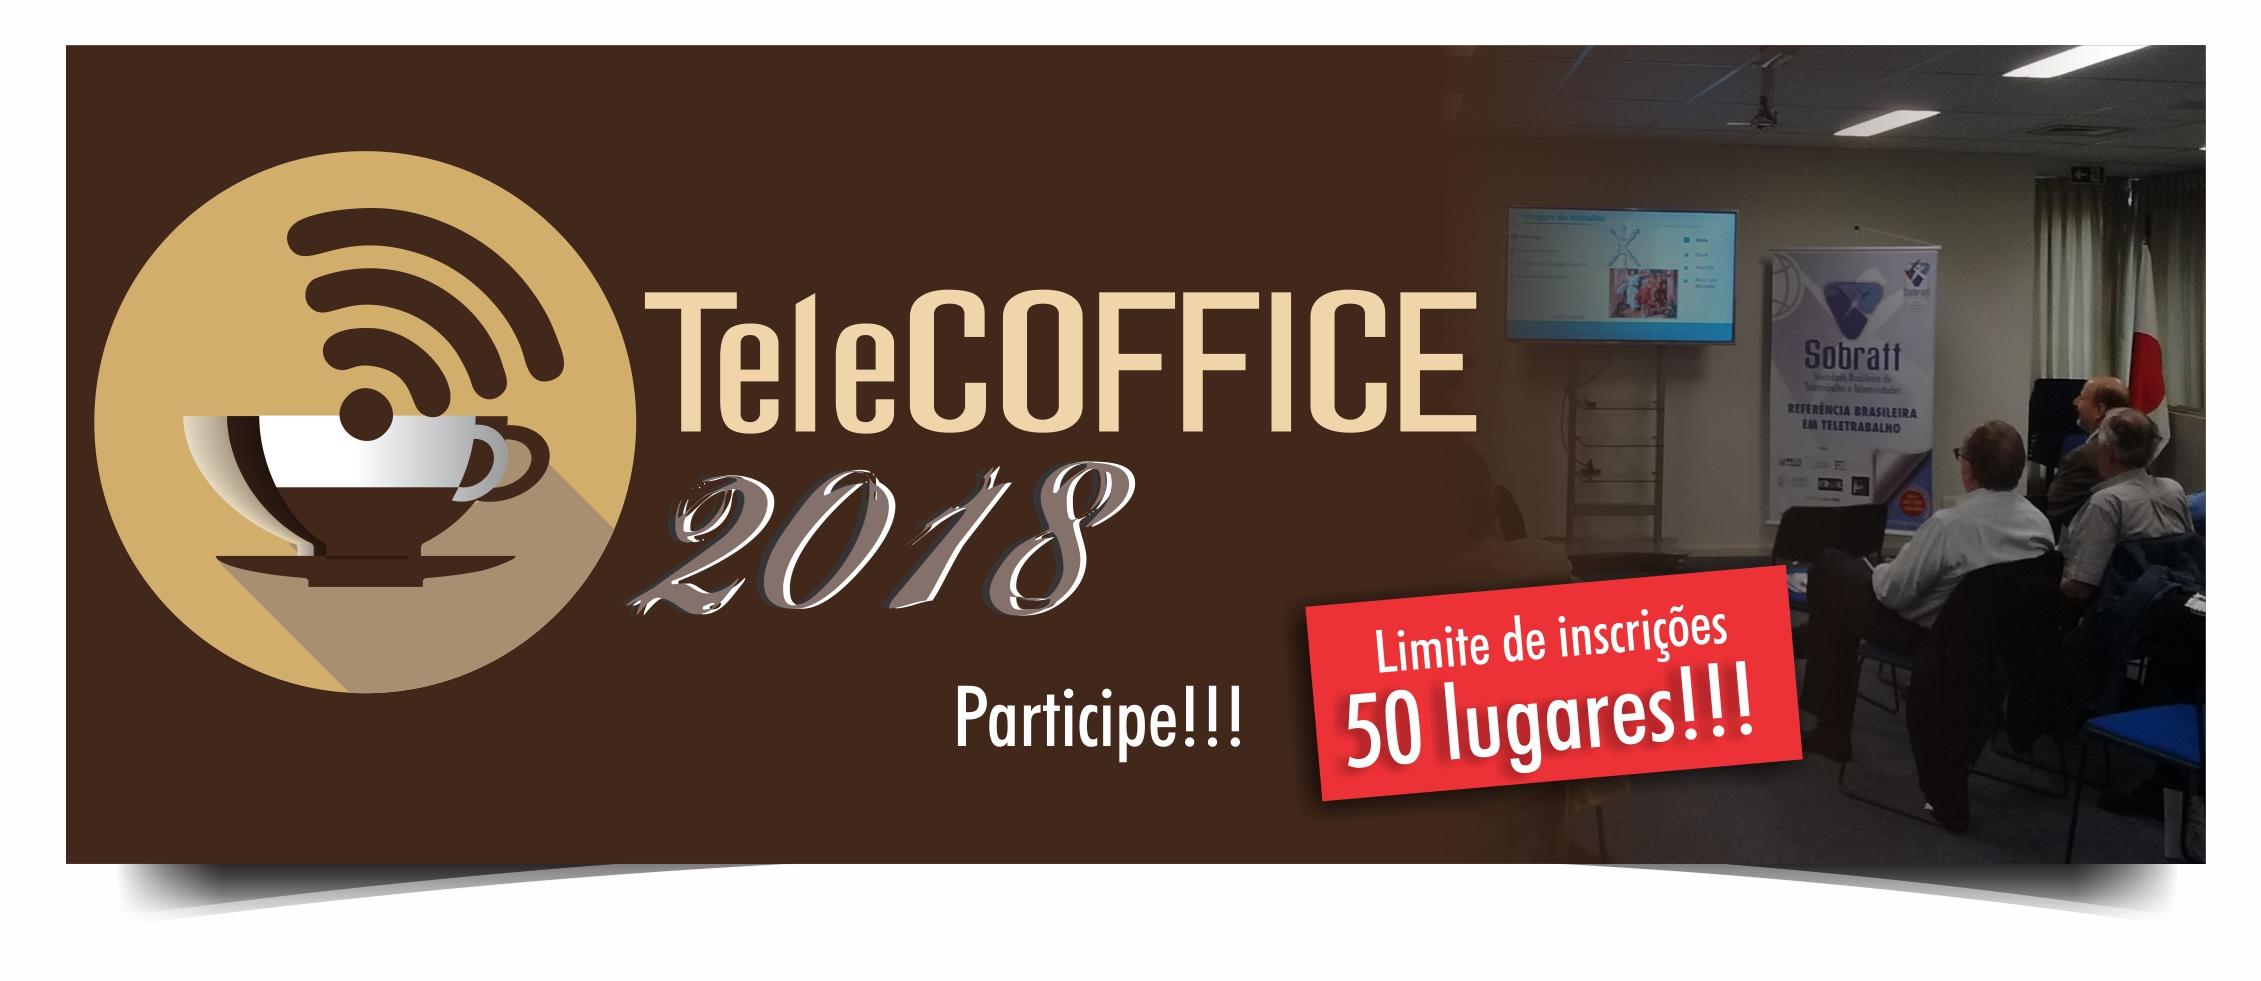 280518_AF_TELECOFFICE_MAIO_CRA_TESTEIRA